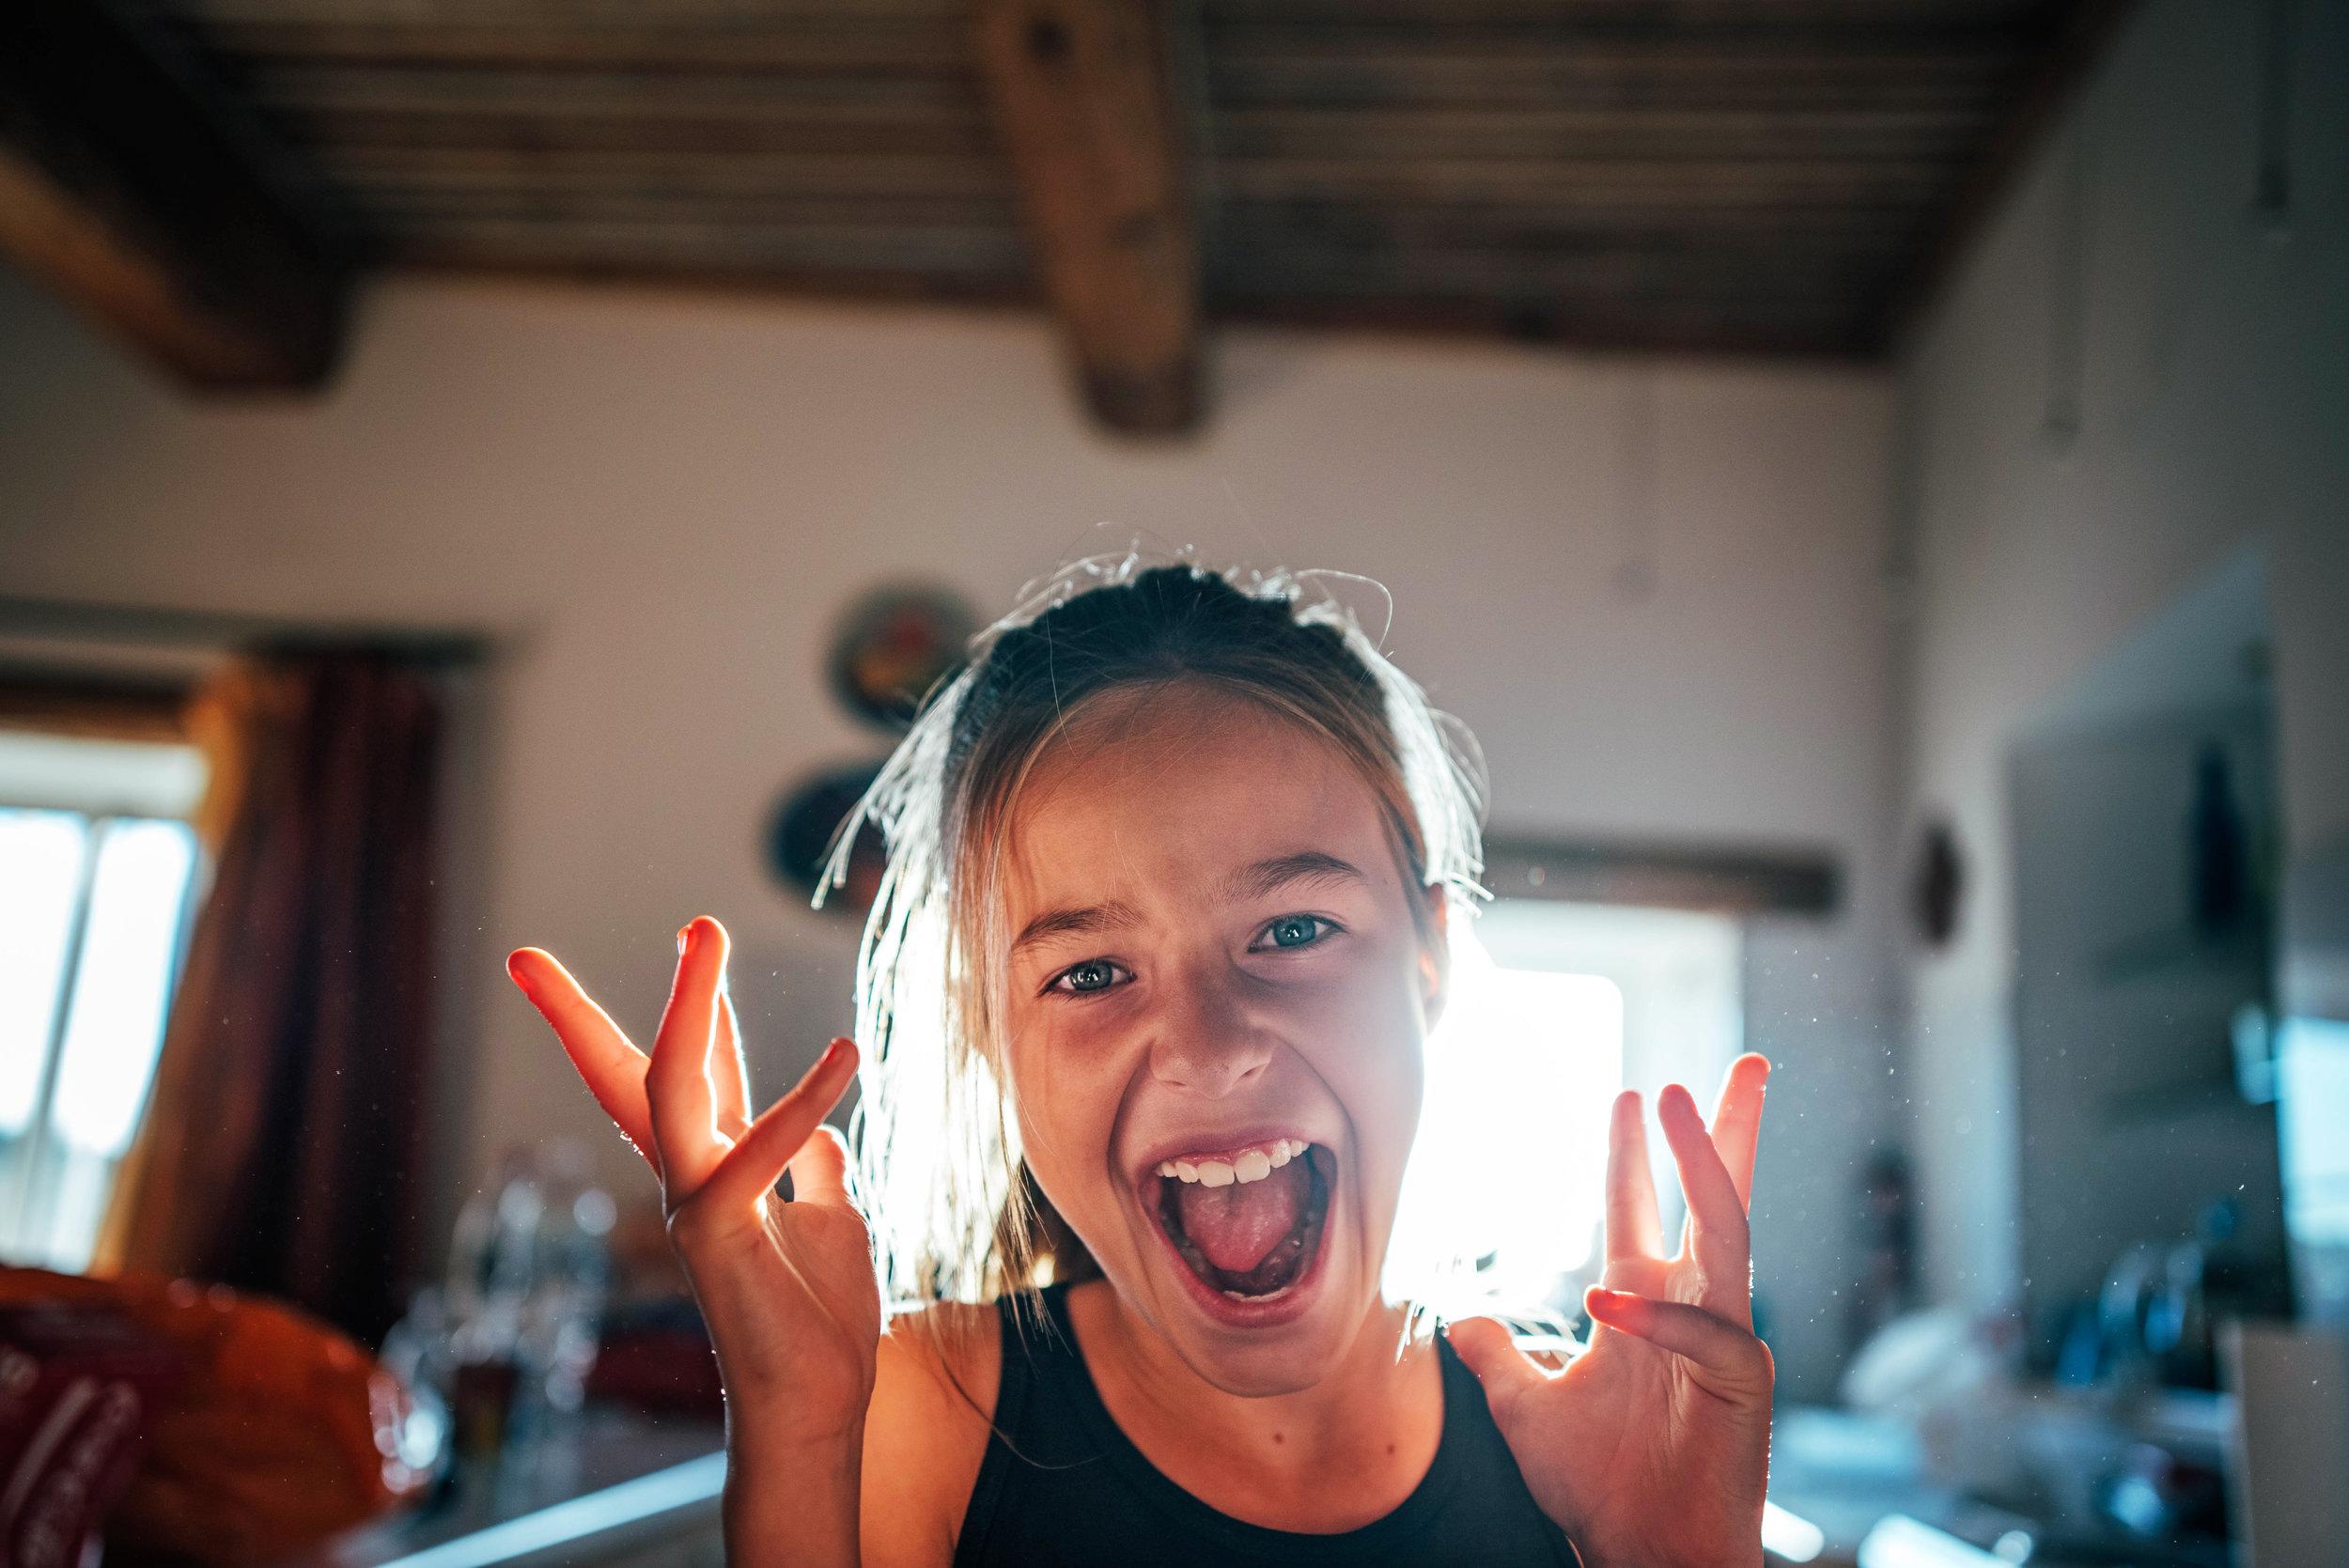 Girl dances in kitchen Essex UK Documentary Portrait Photographer